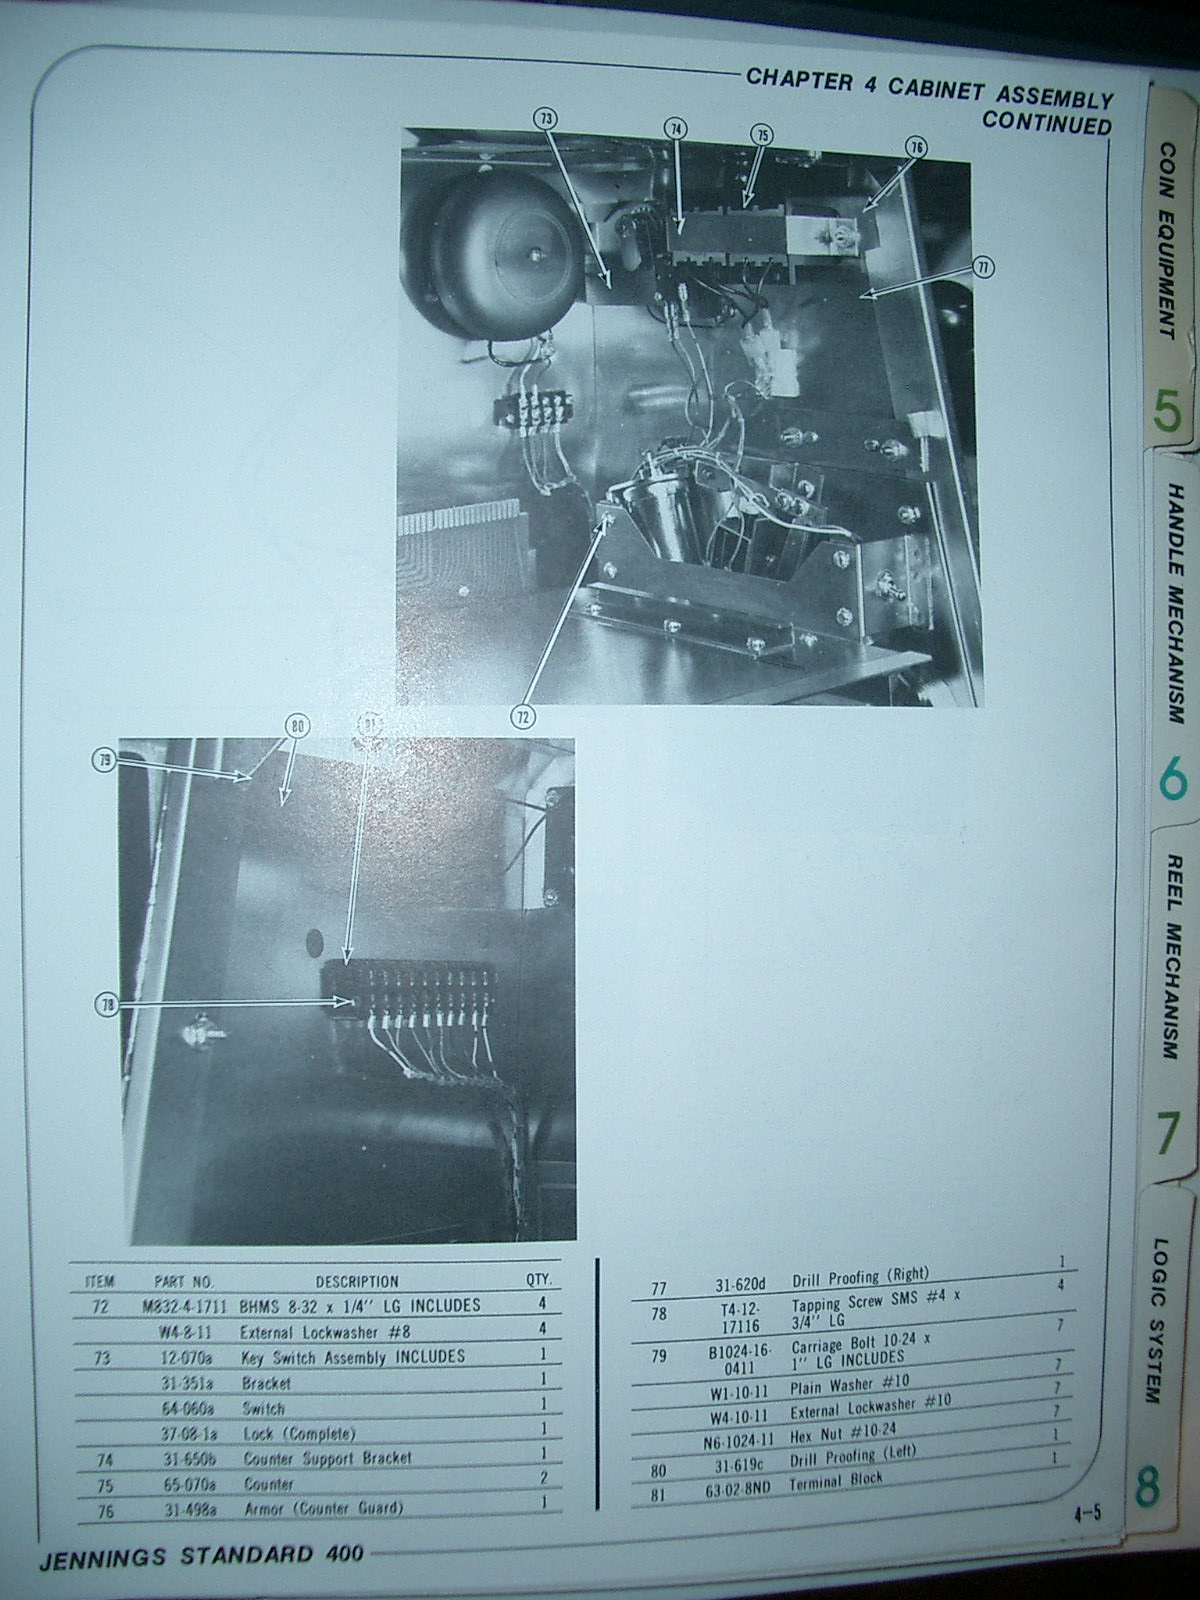 Igt Repair Manual Dixon 4423 Wiring Diagram G23 Premium Widescreen Upright Array Slot Machine Bally Roulette Rh Vassermetal Ga